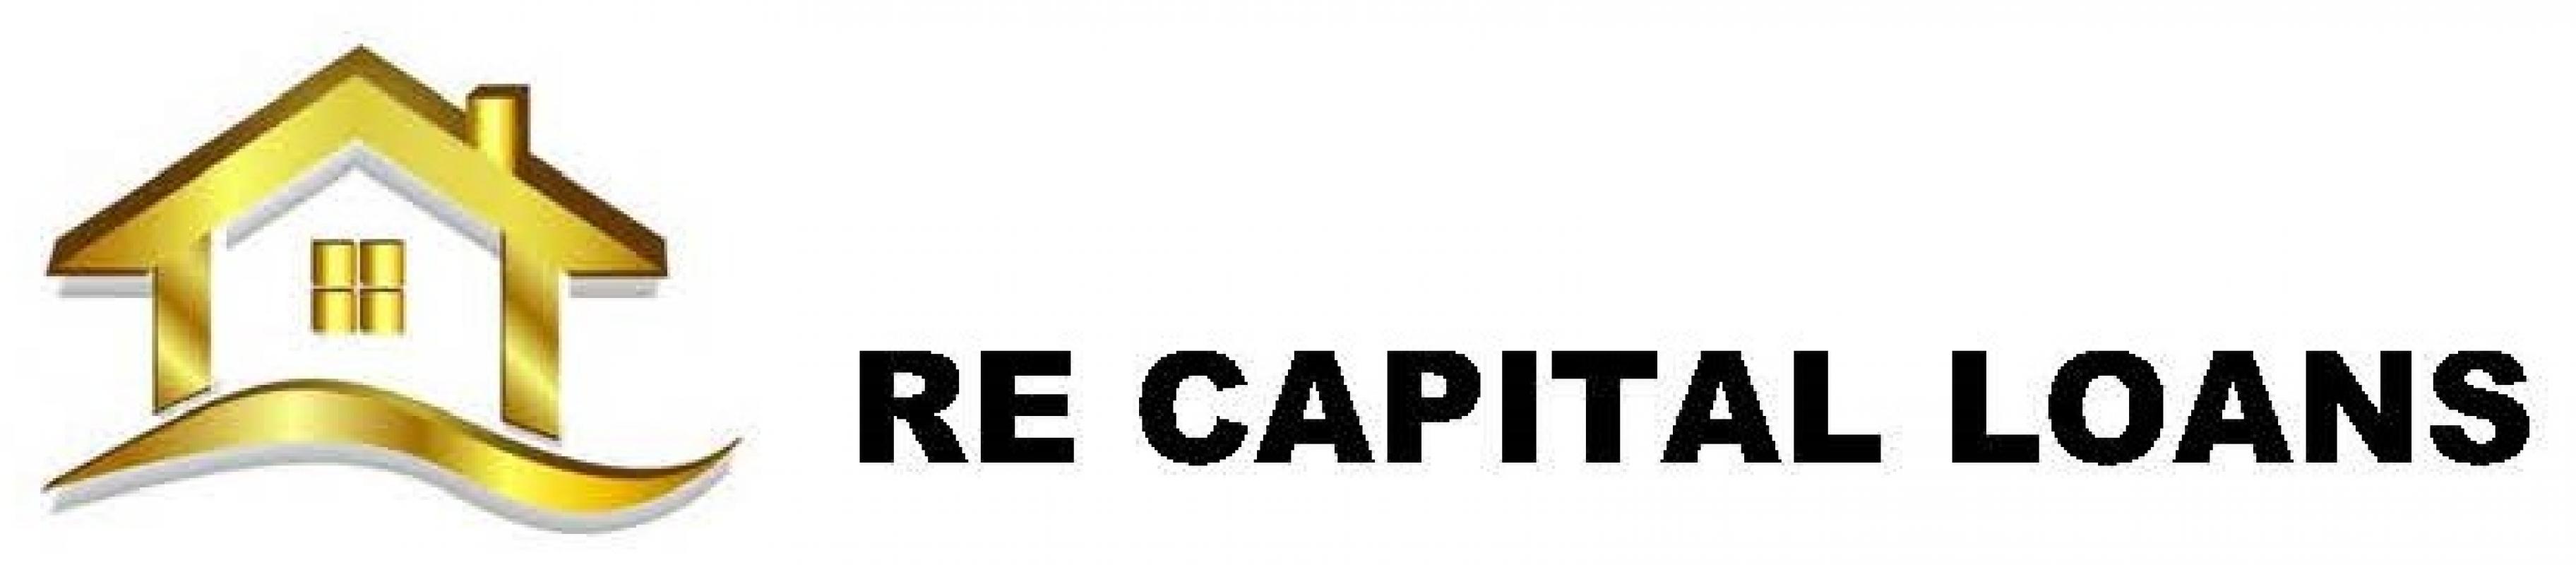 RE CAPITAL LOANS logo